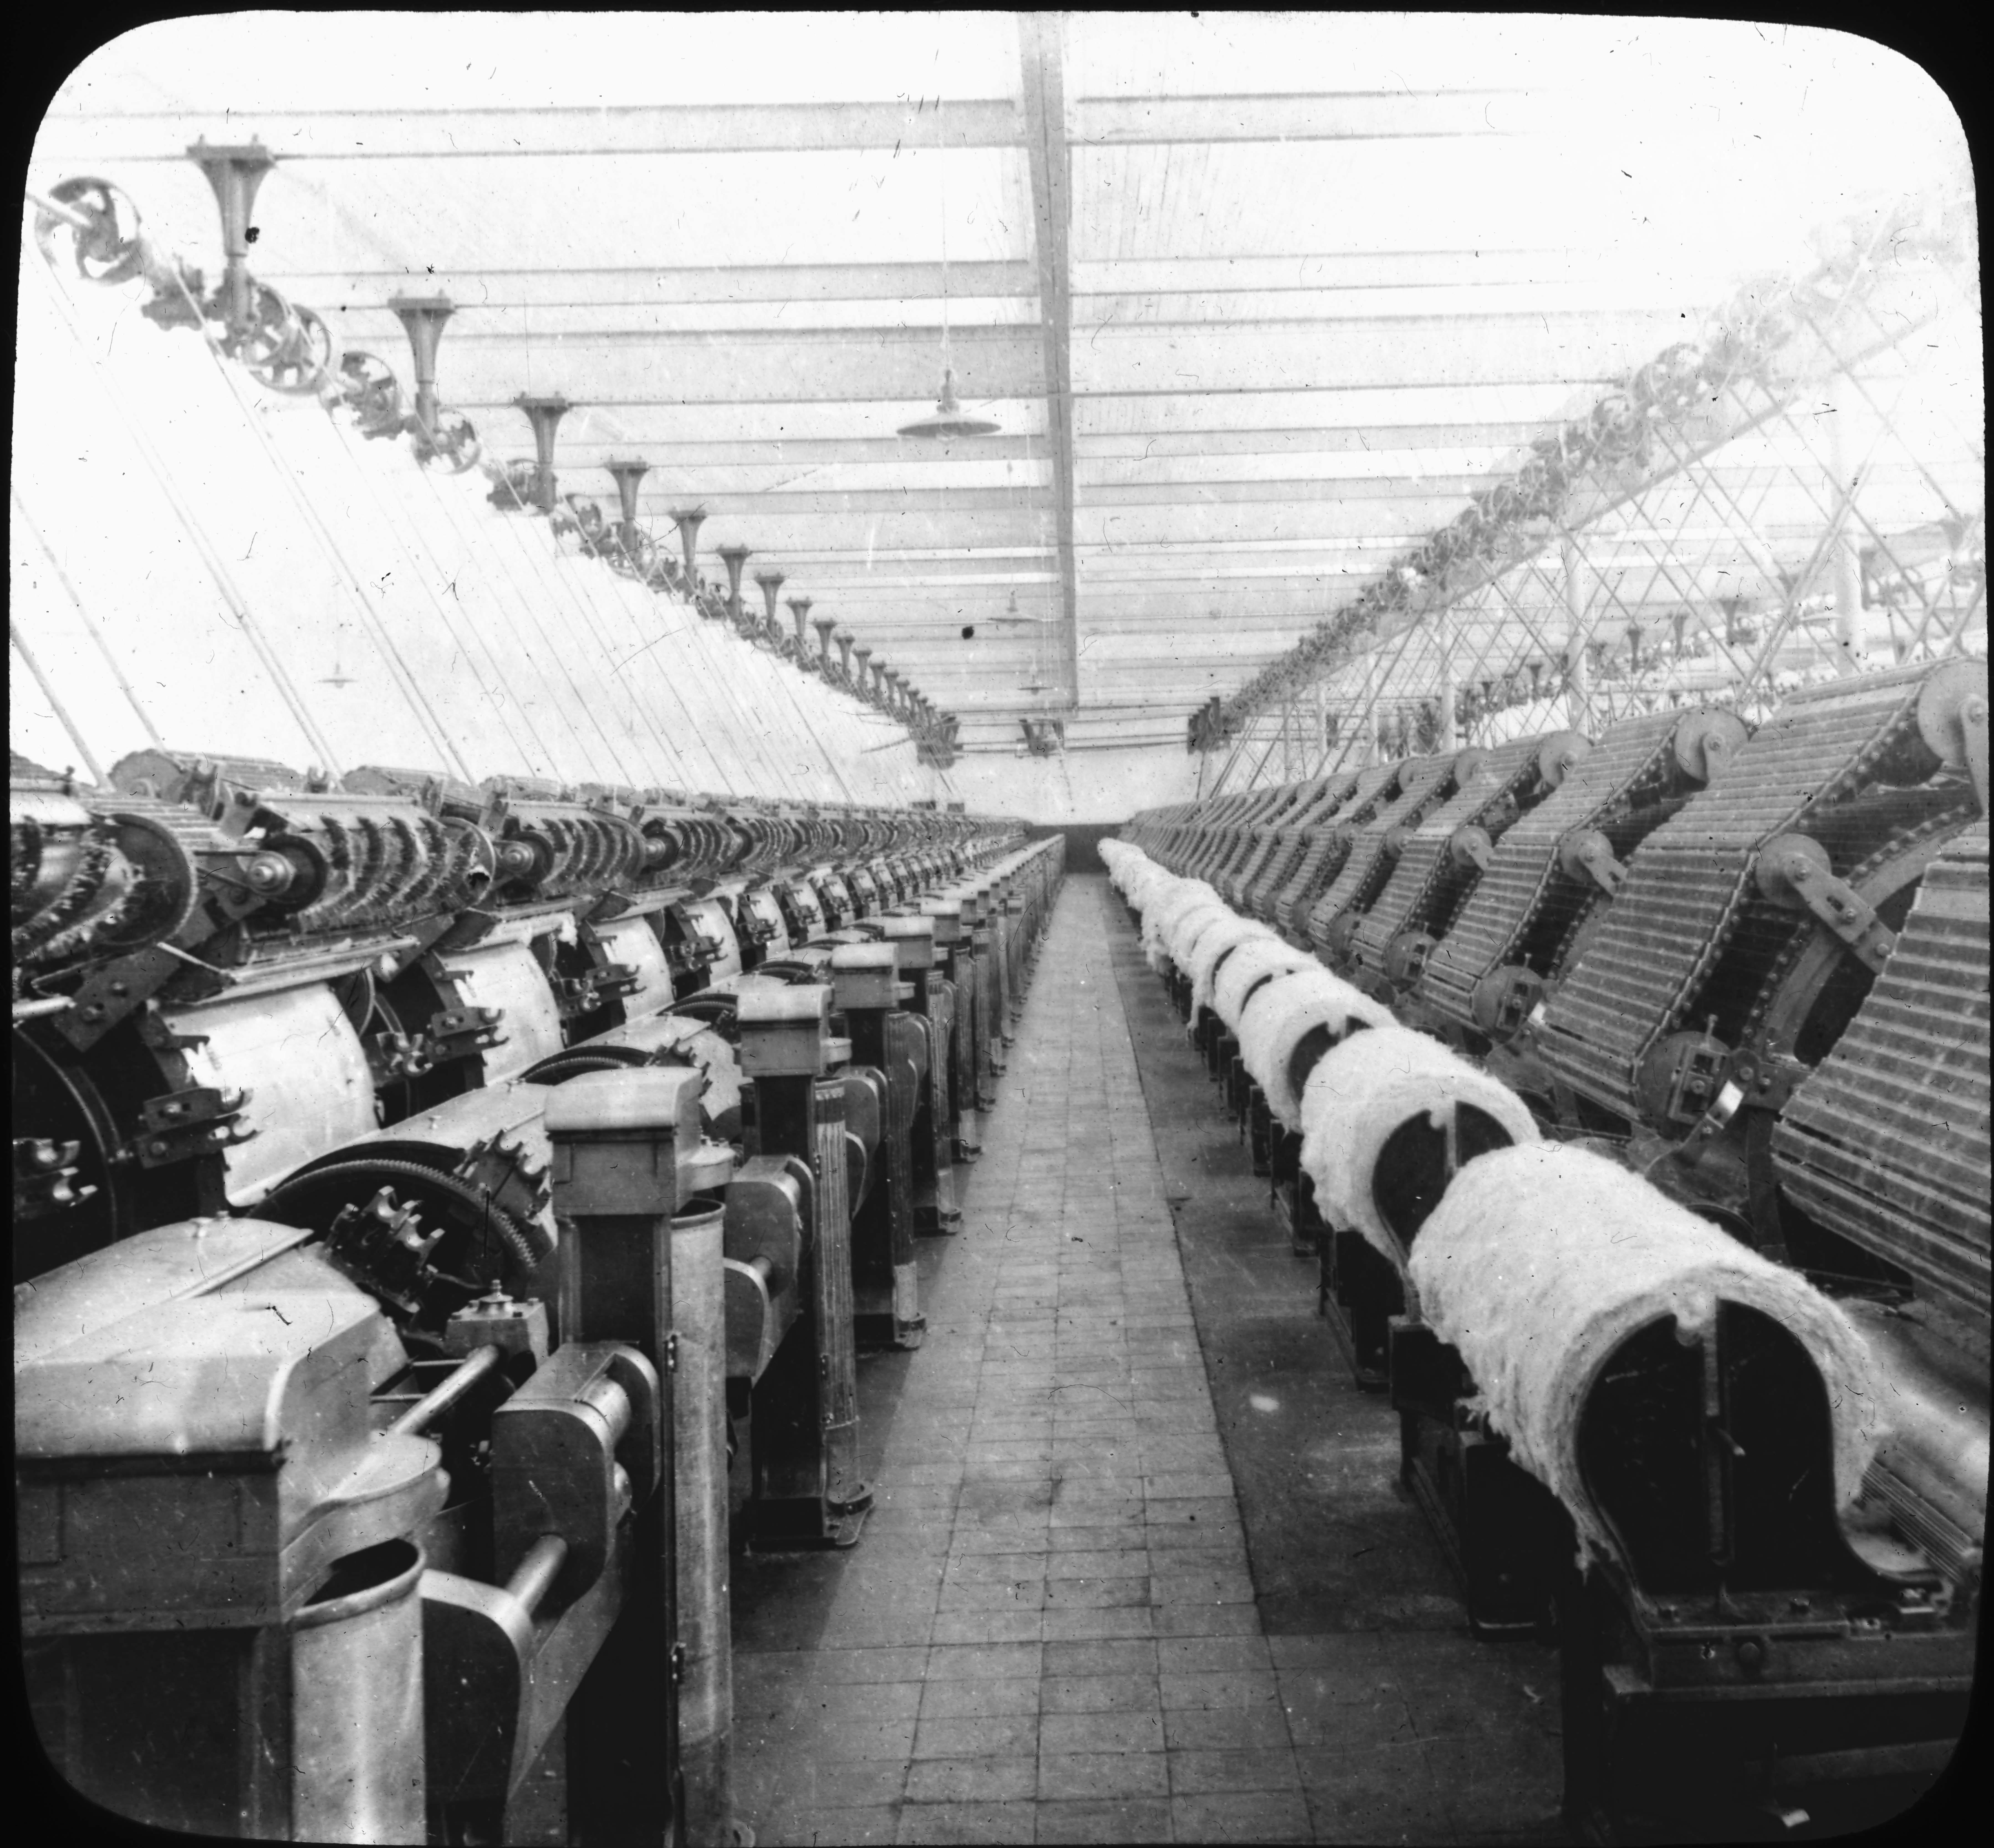 Carding Room, Cotton Mills, Orizaba, Mexico.